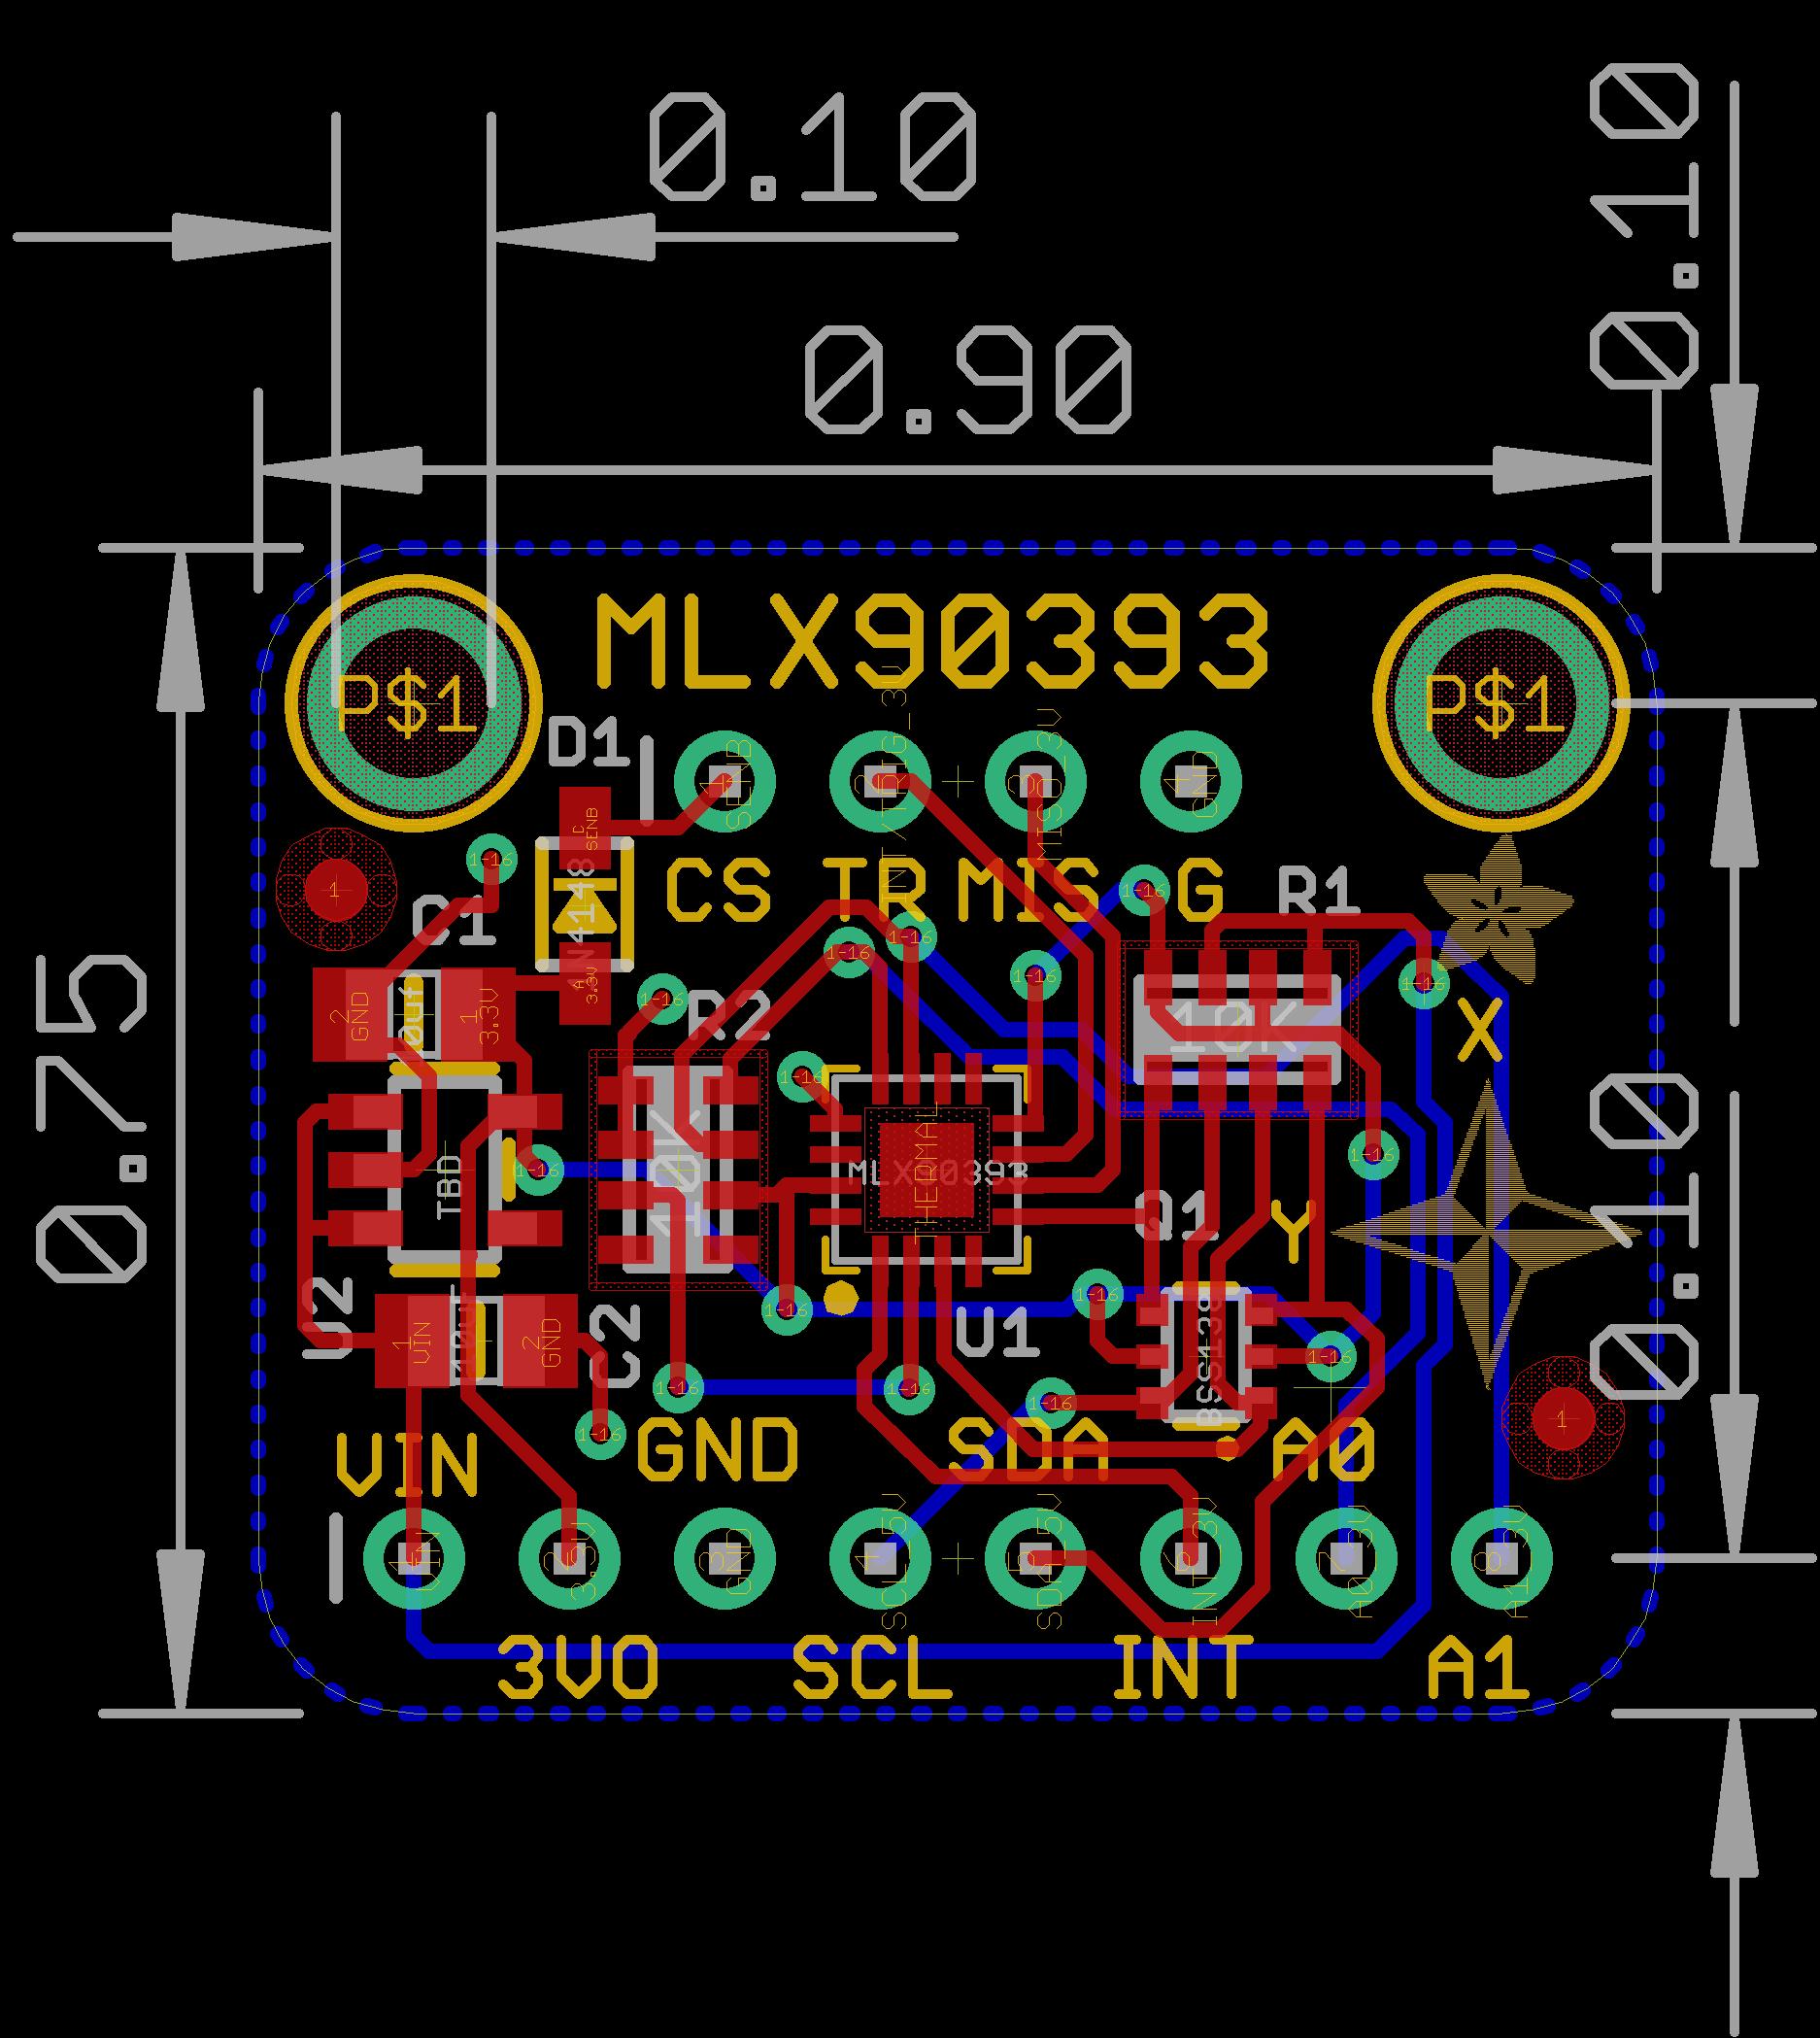 sensors_MLX90393_Dimensions.png